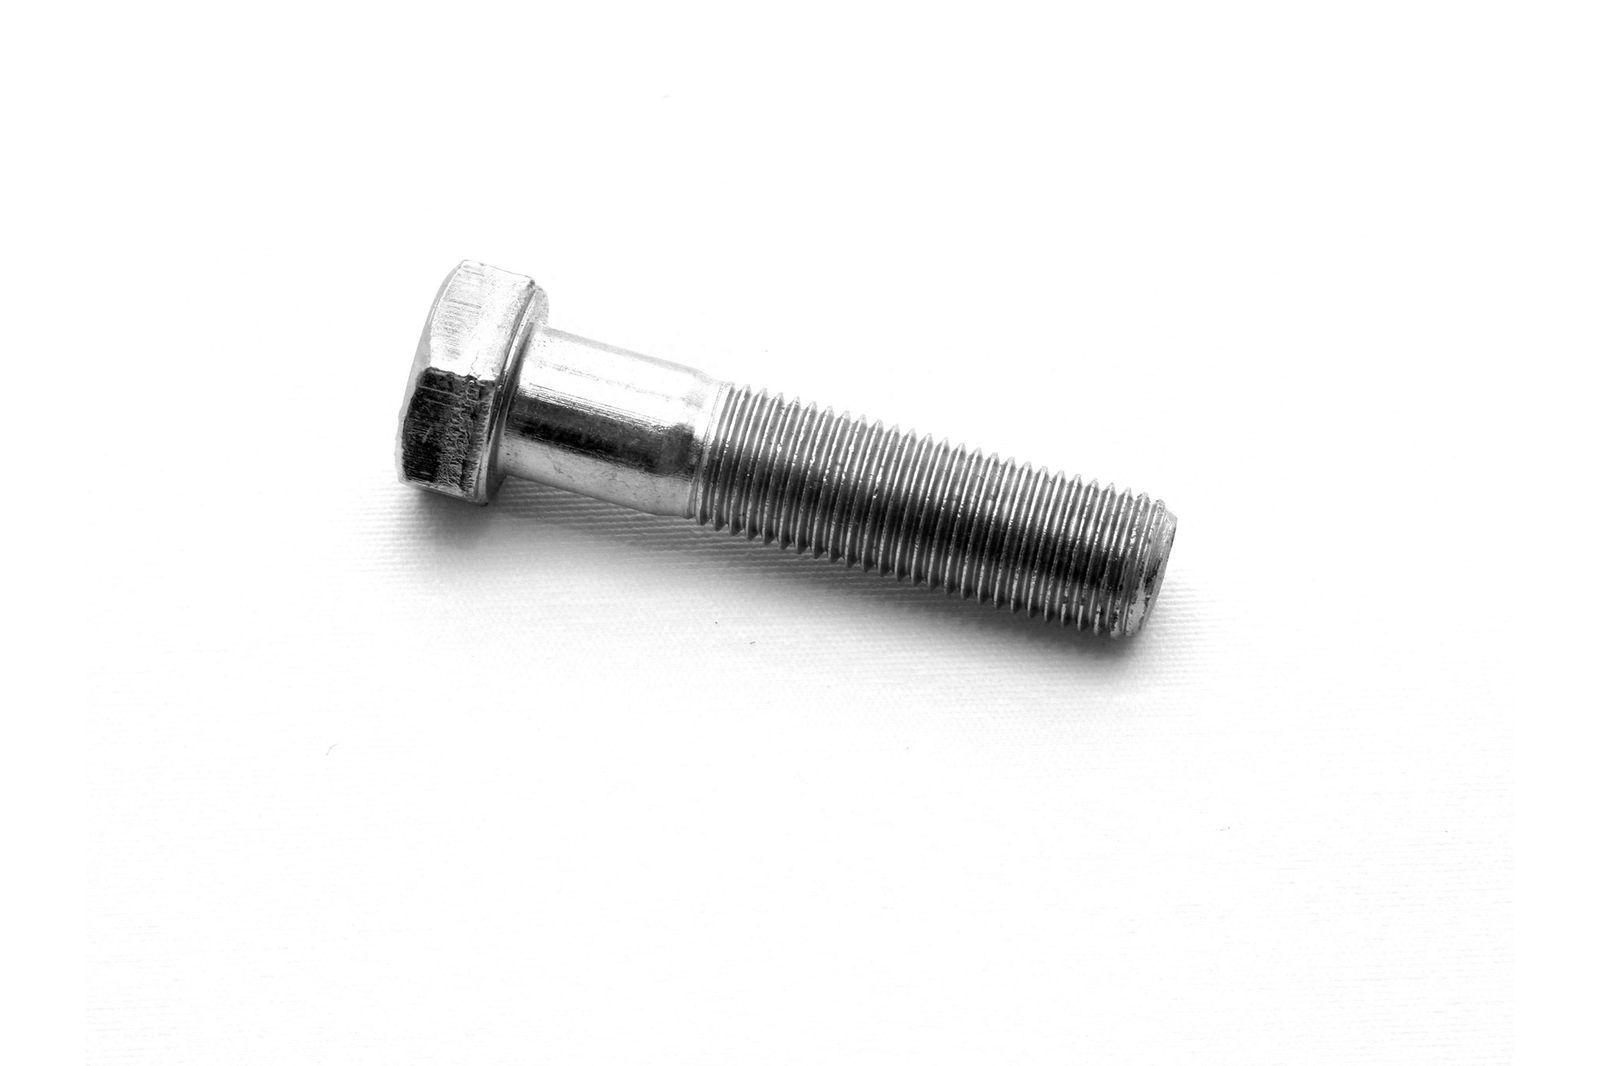 "#1002-38 Bolzen UNF 3/8"" x 1 5/8"", BH606131"